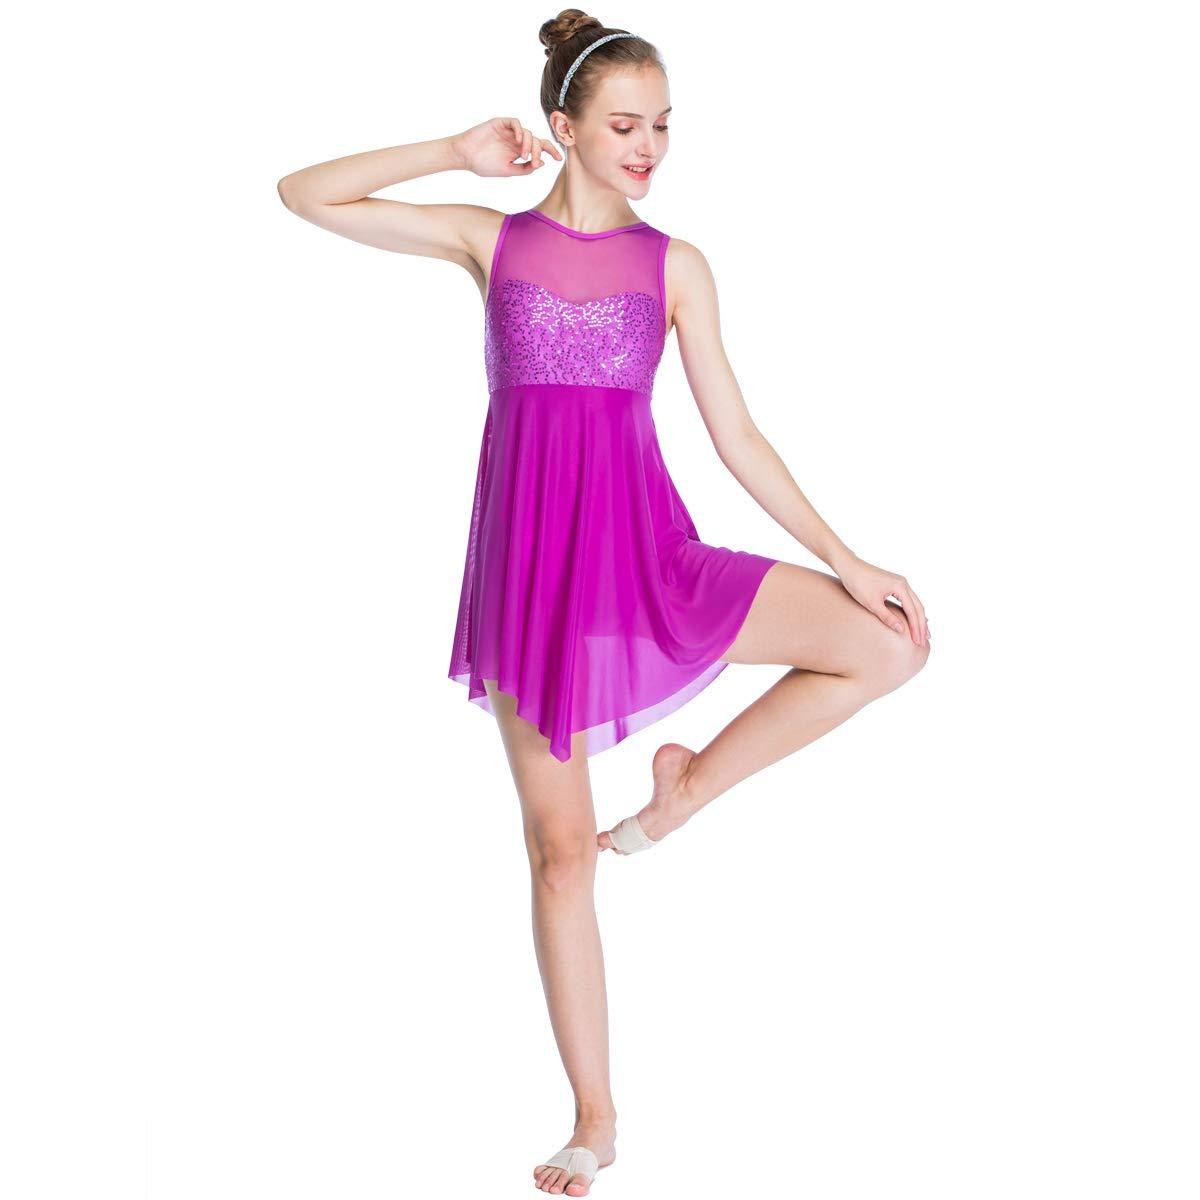 95c486ec7 Amazon.com  MiDee Lyrical Dance Costume Dress Illusion Sweetheart ...